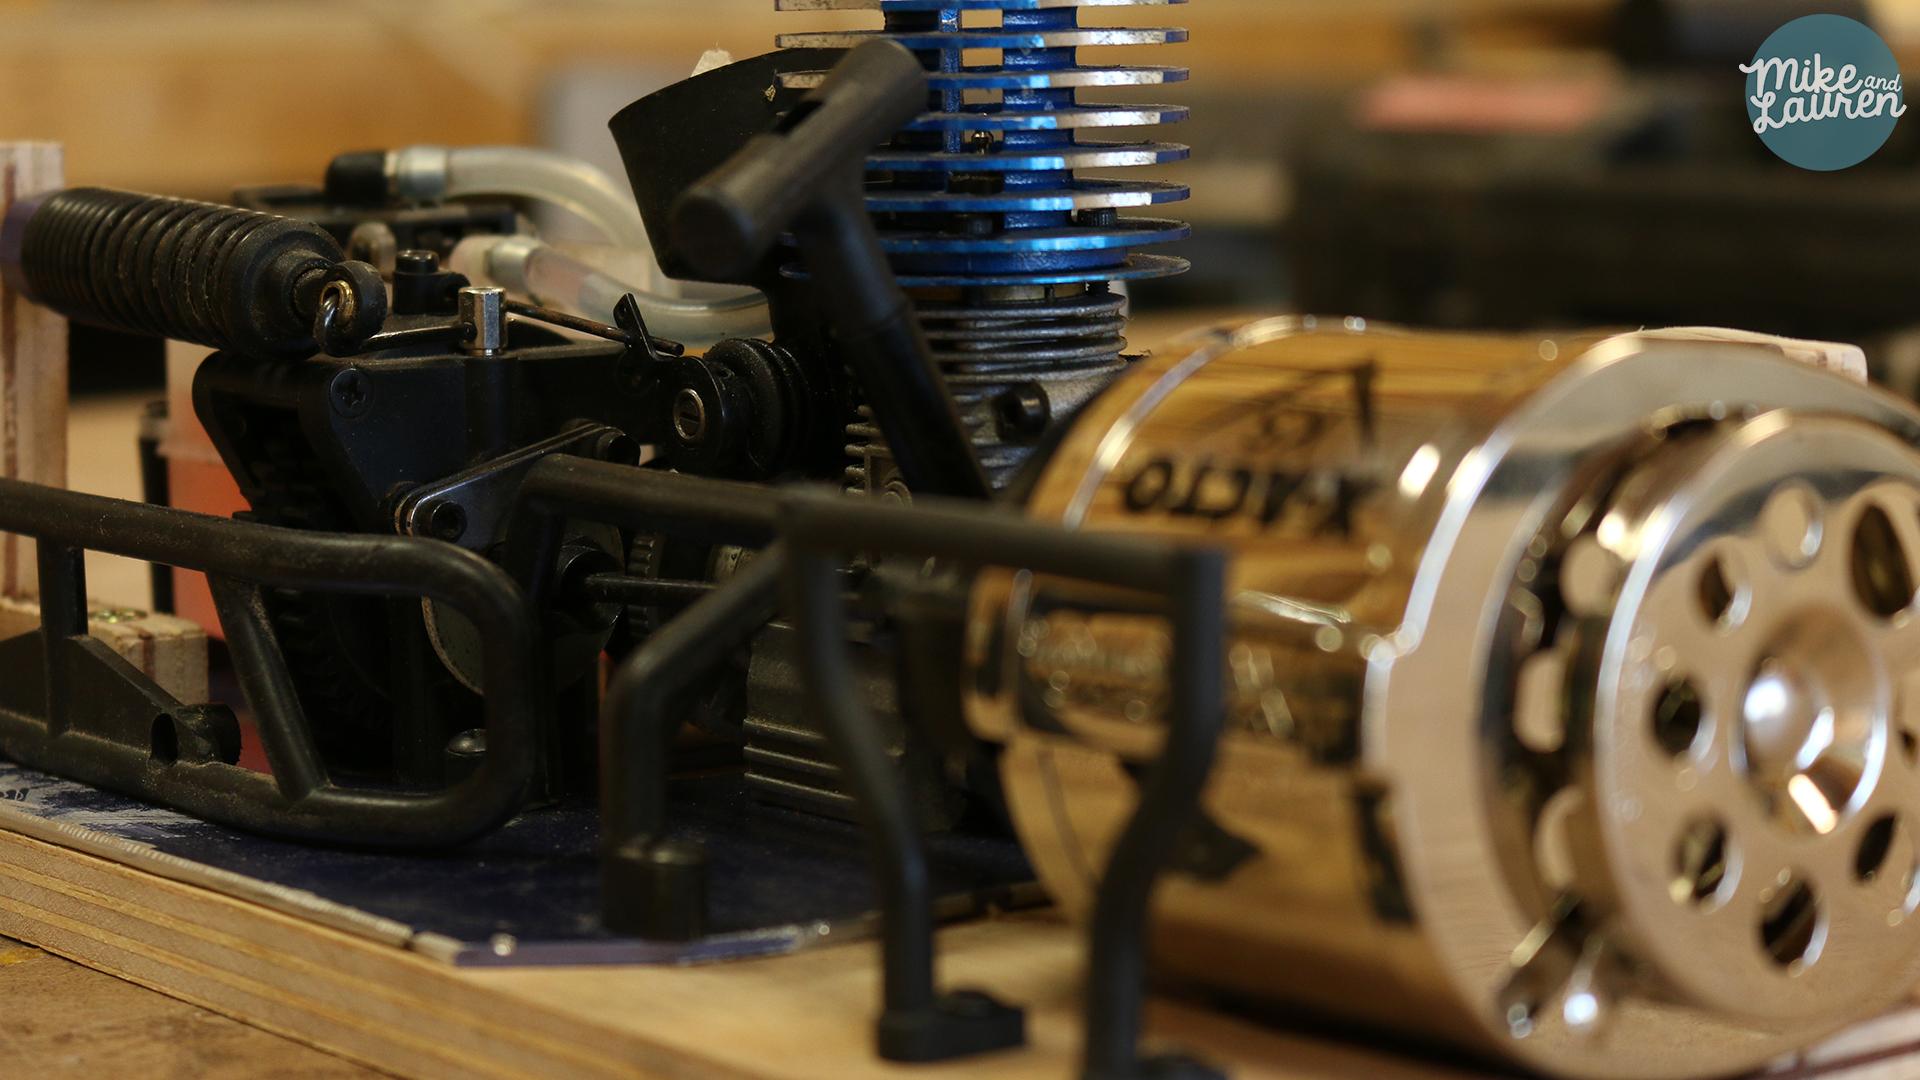 Turbocharge a Pencil Sharpener with an R/C Car Engine